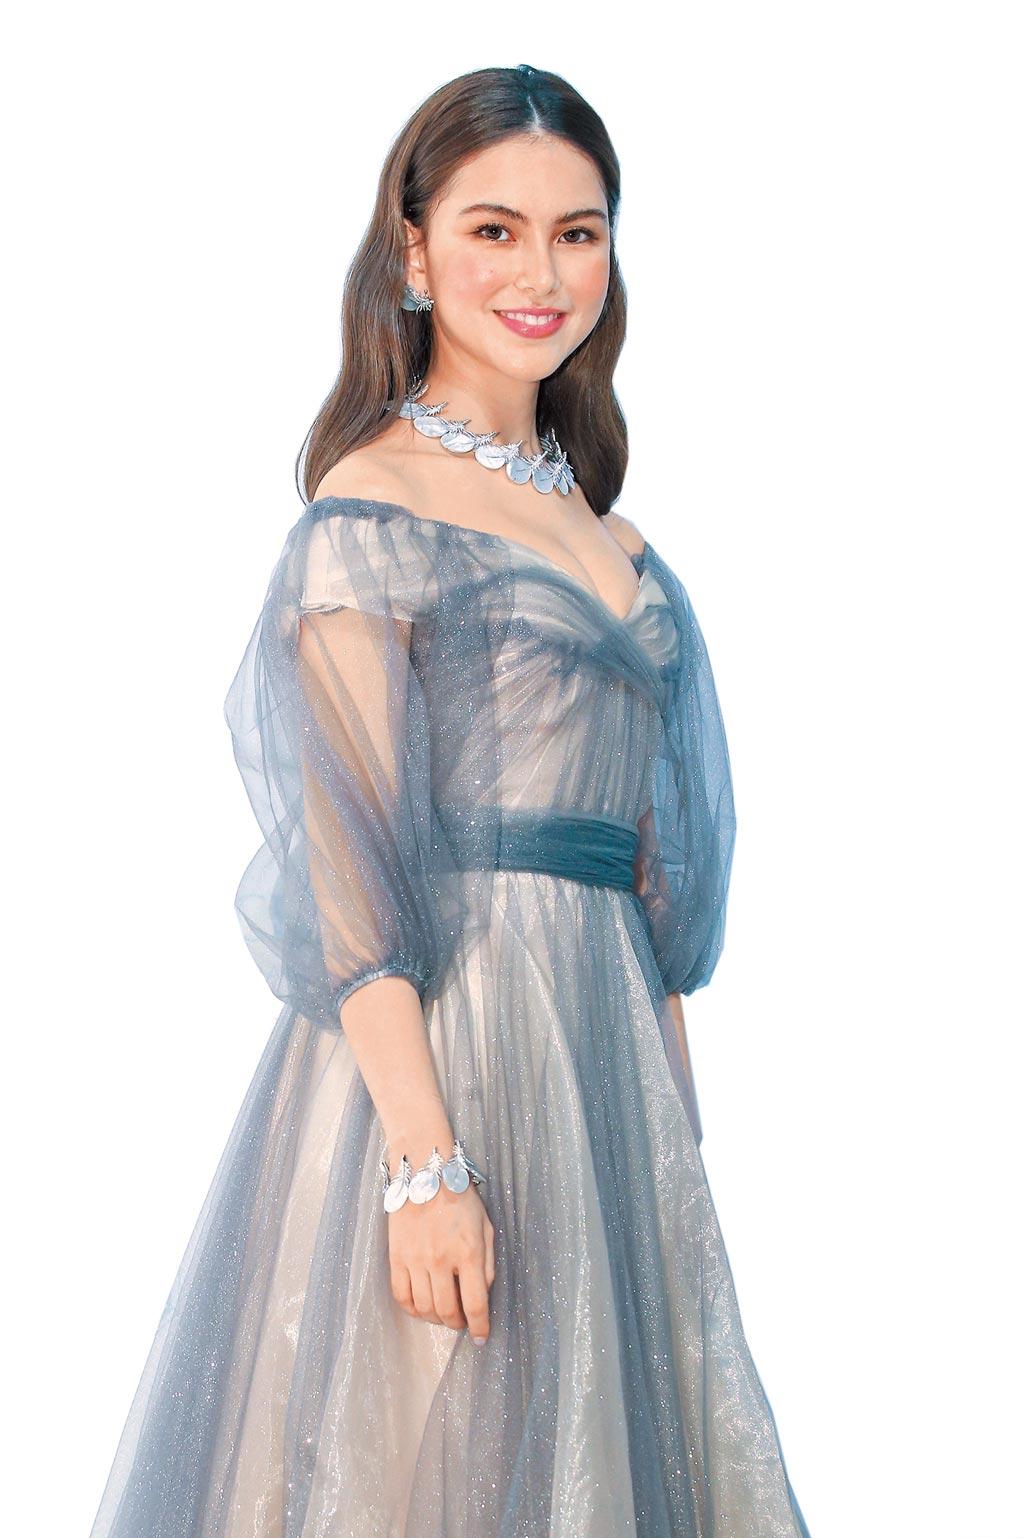 Boucheron品牌大使昆凌出席珠寶展分享她的理財經,透露買珠寶能保值,將來還可留給女兒。(粘耿豪攝)